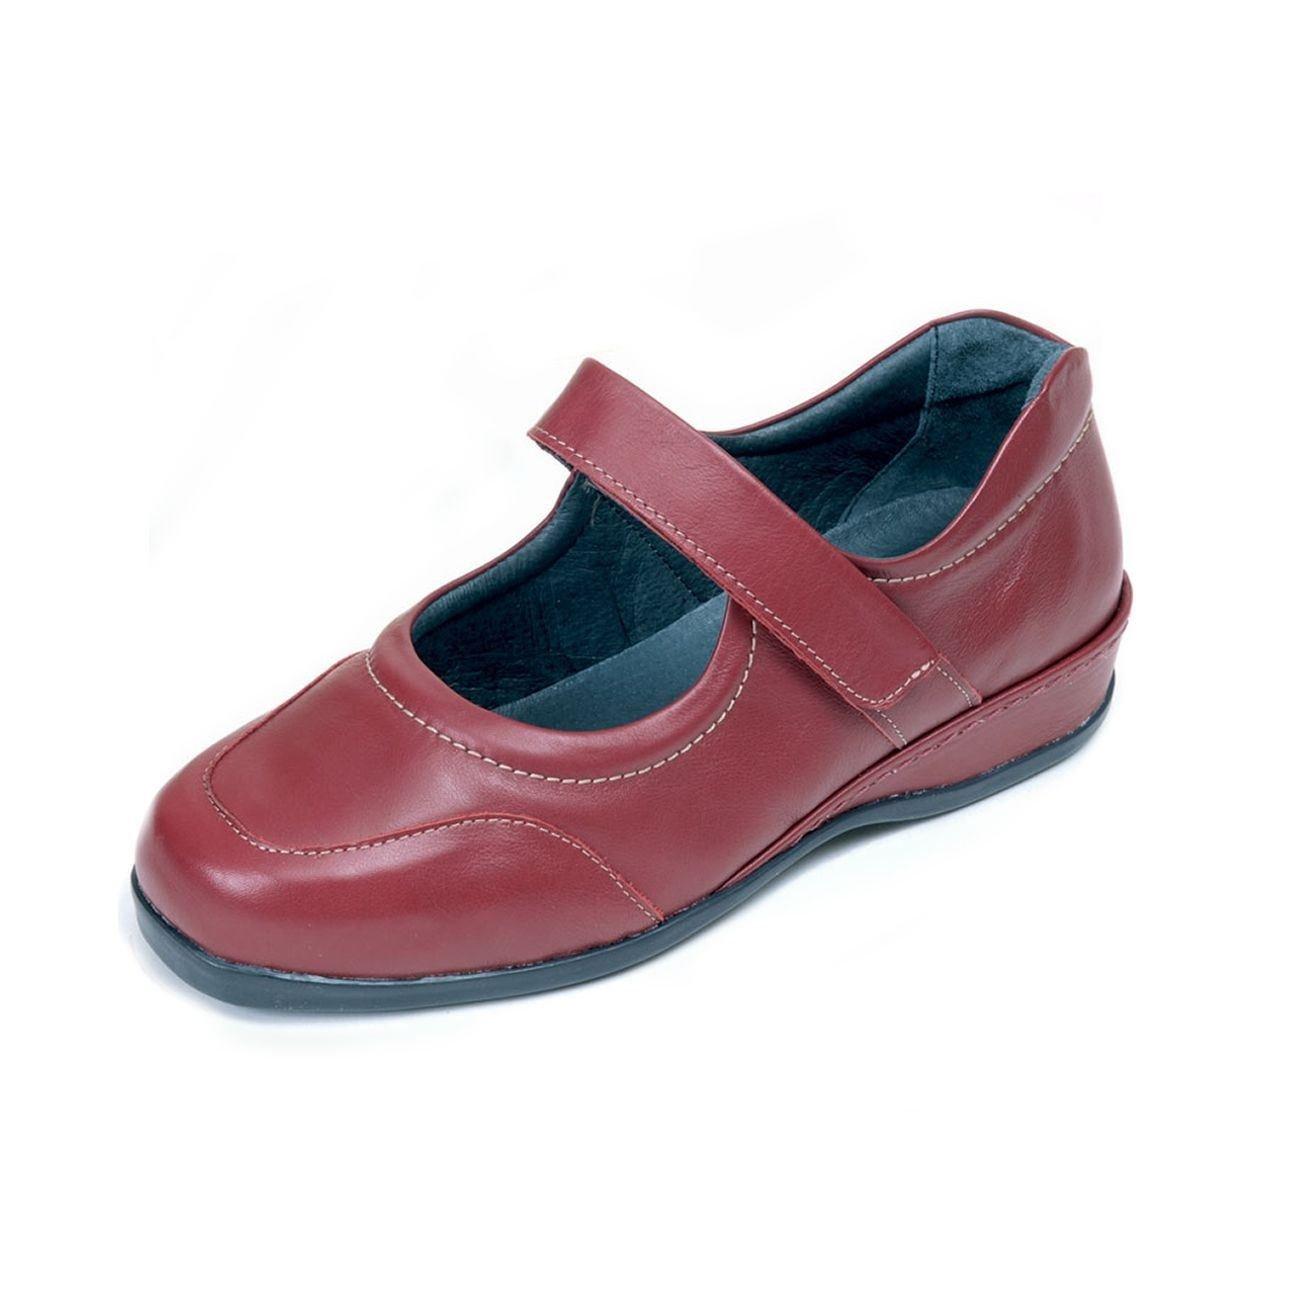 d6b880b73d39 Sandpiper Women s Shoe  Welton